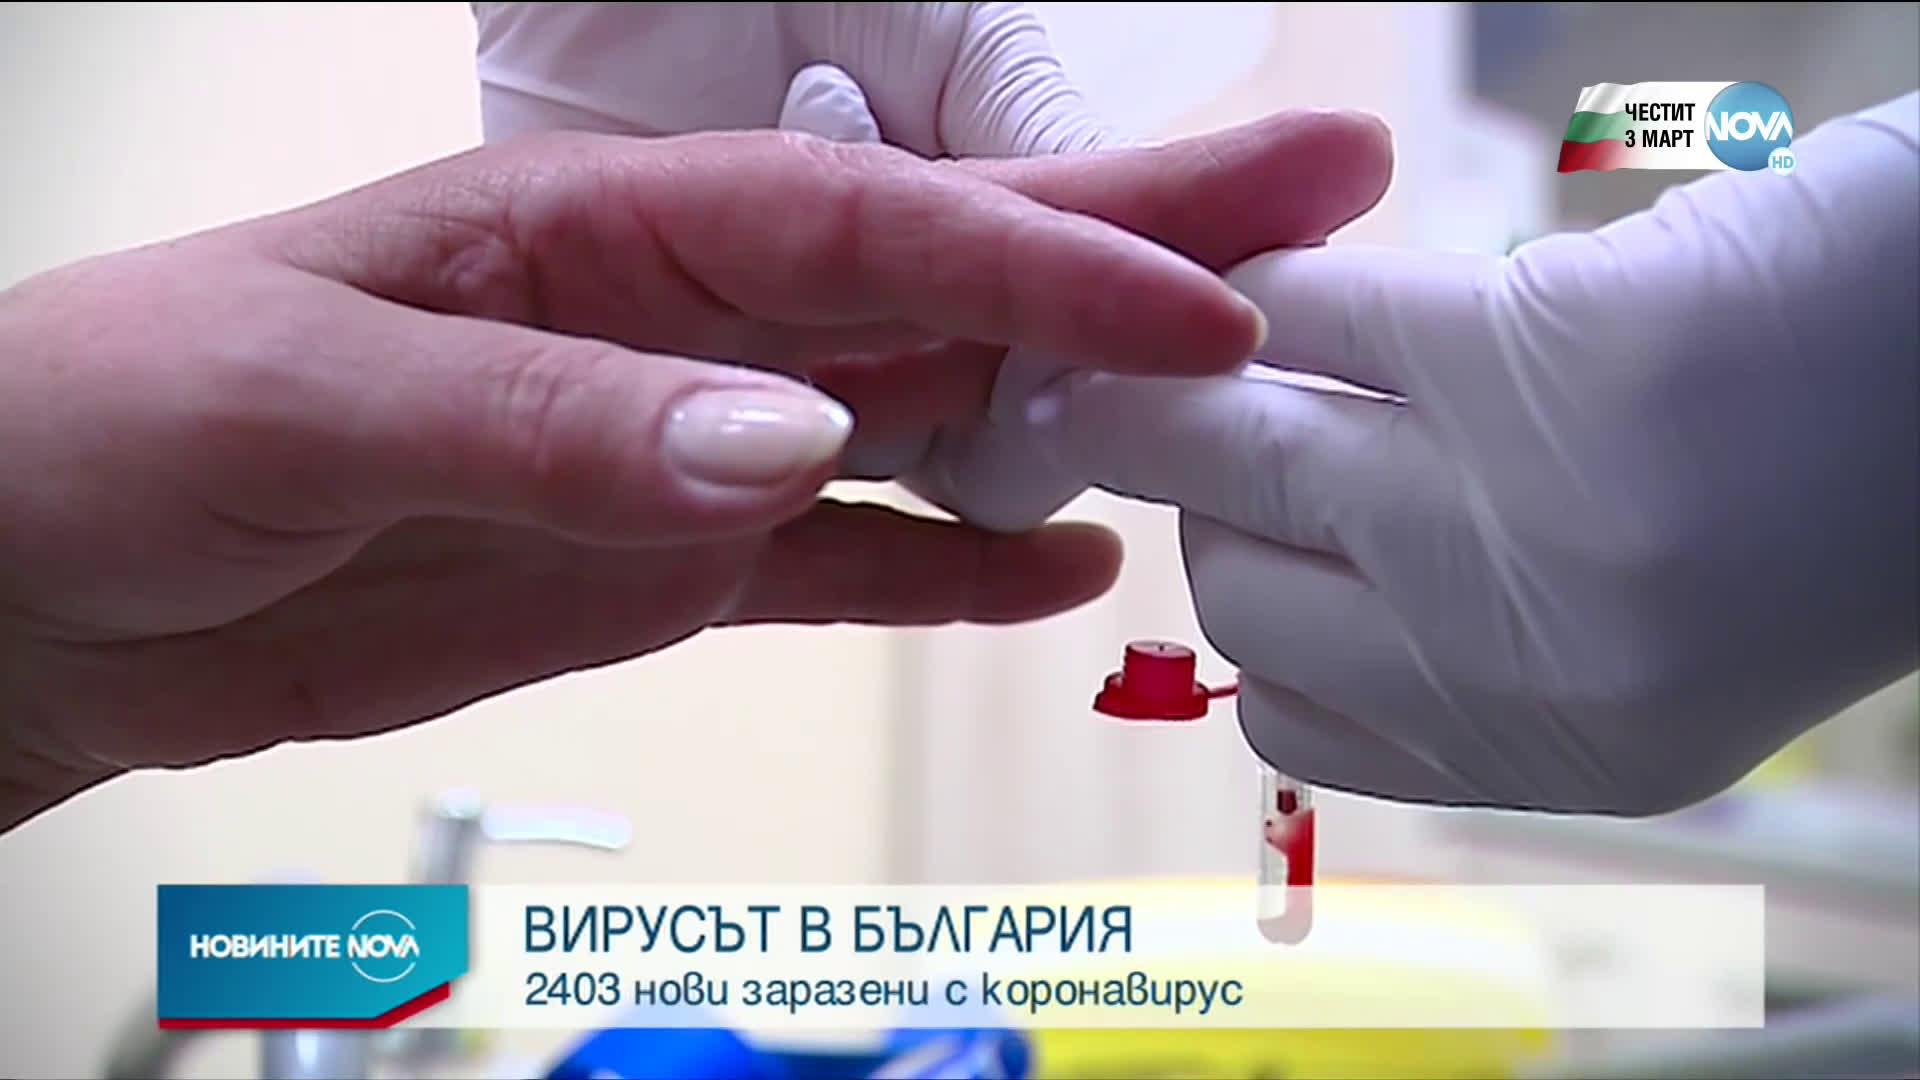 Над 5 000 хоспитализирани с COVID-19